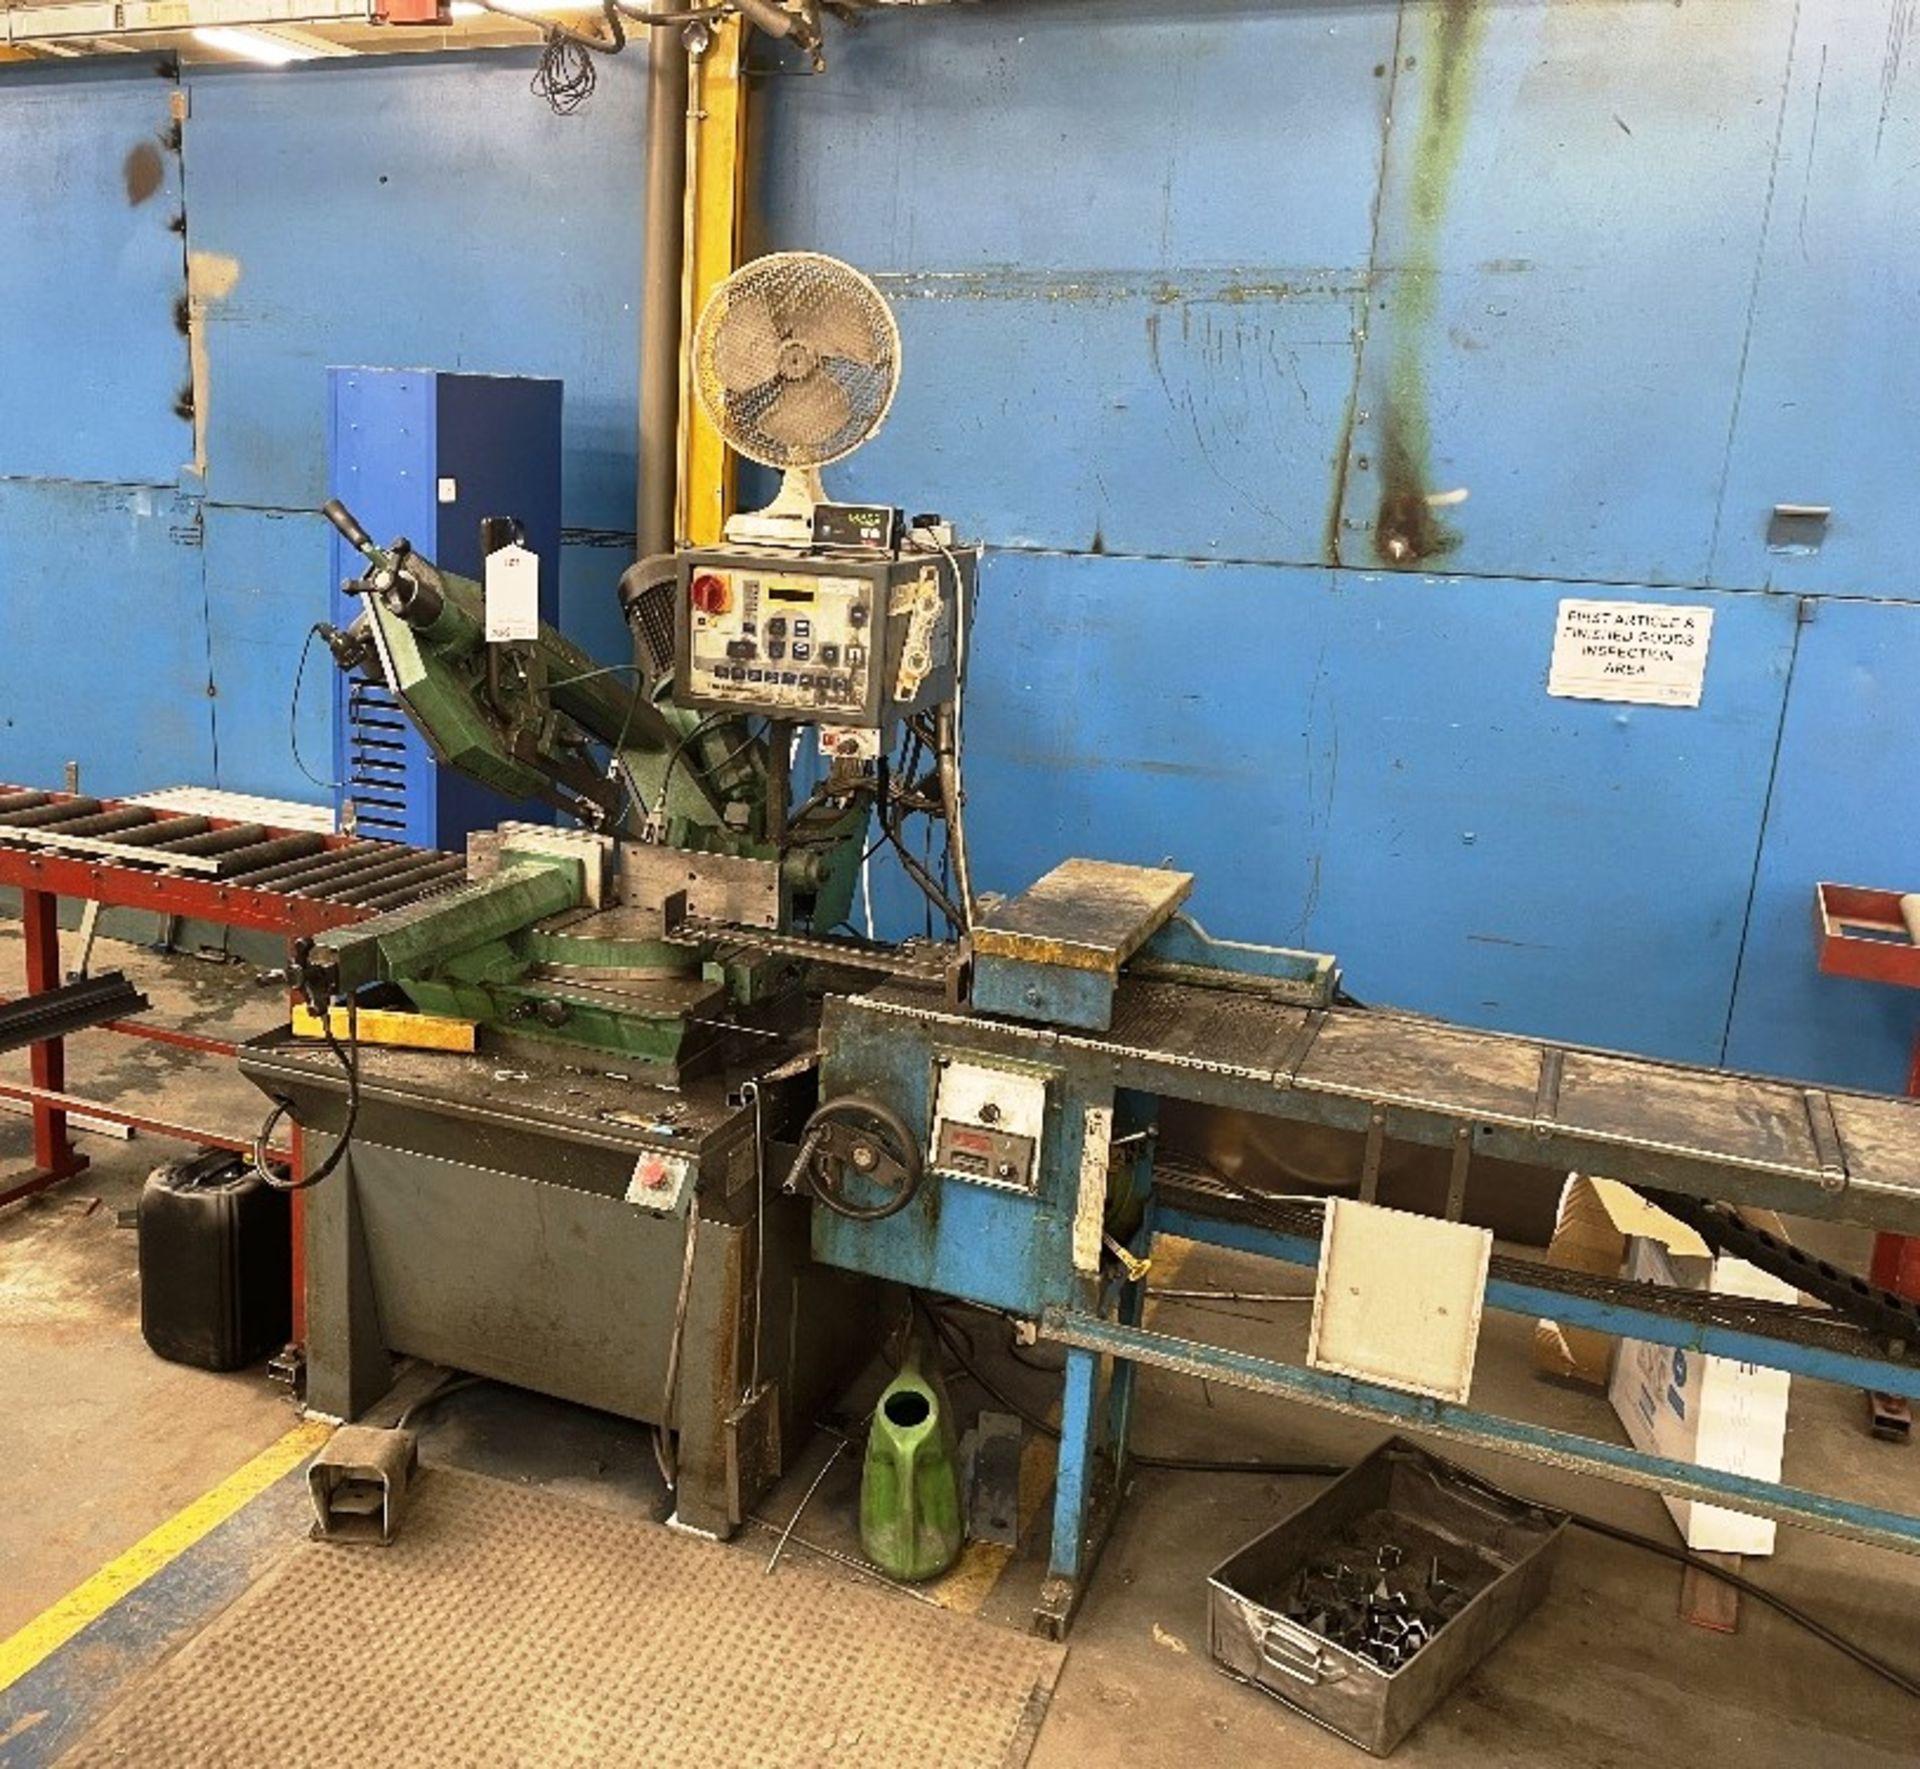 Pedrazzoli Brown SC 300 Horizontal Bandsaw w/ 4m Powered Conveyor - Image 6 of 12